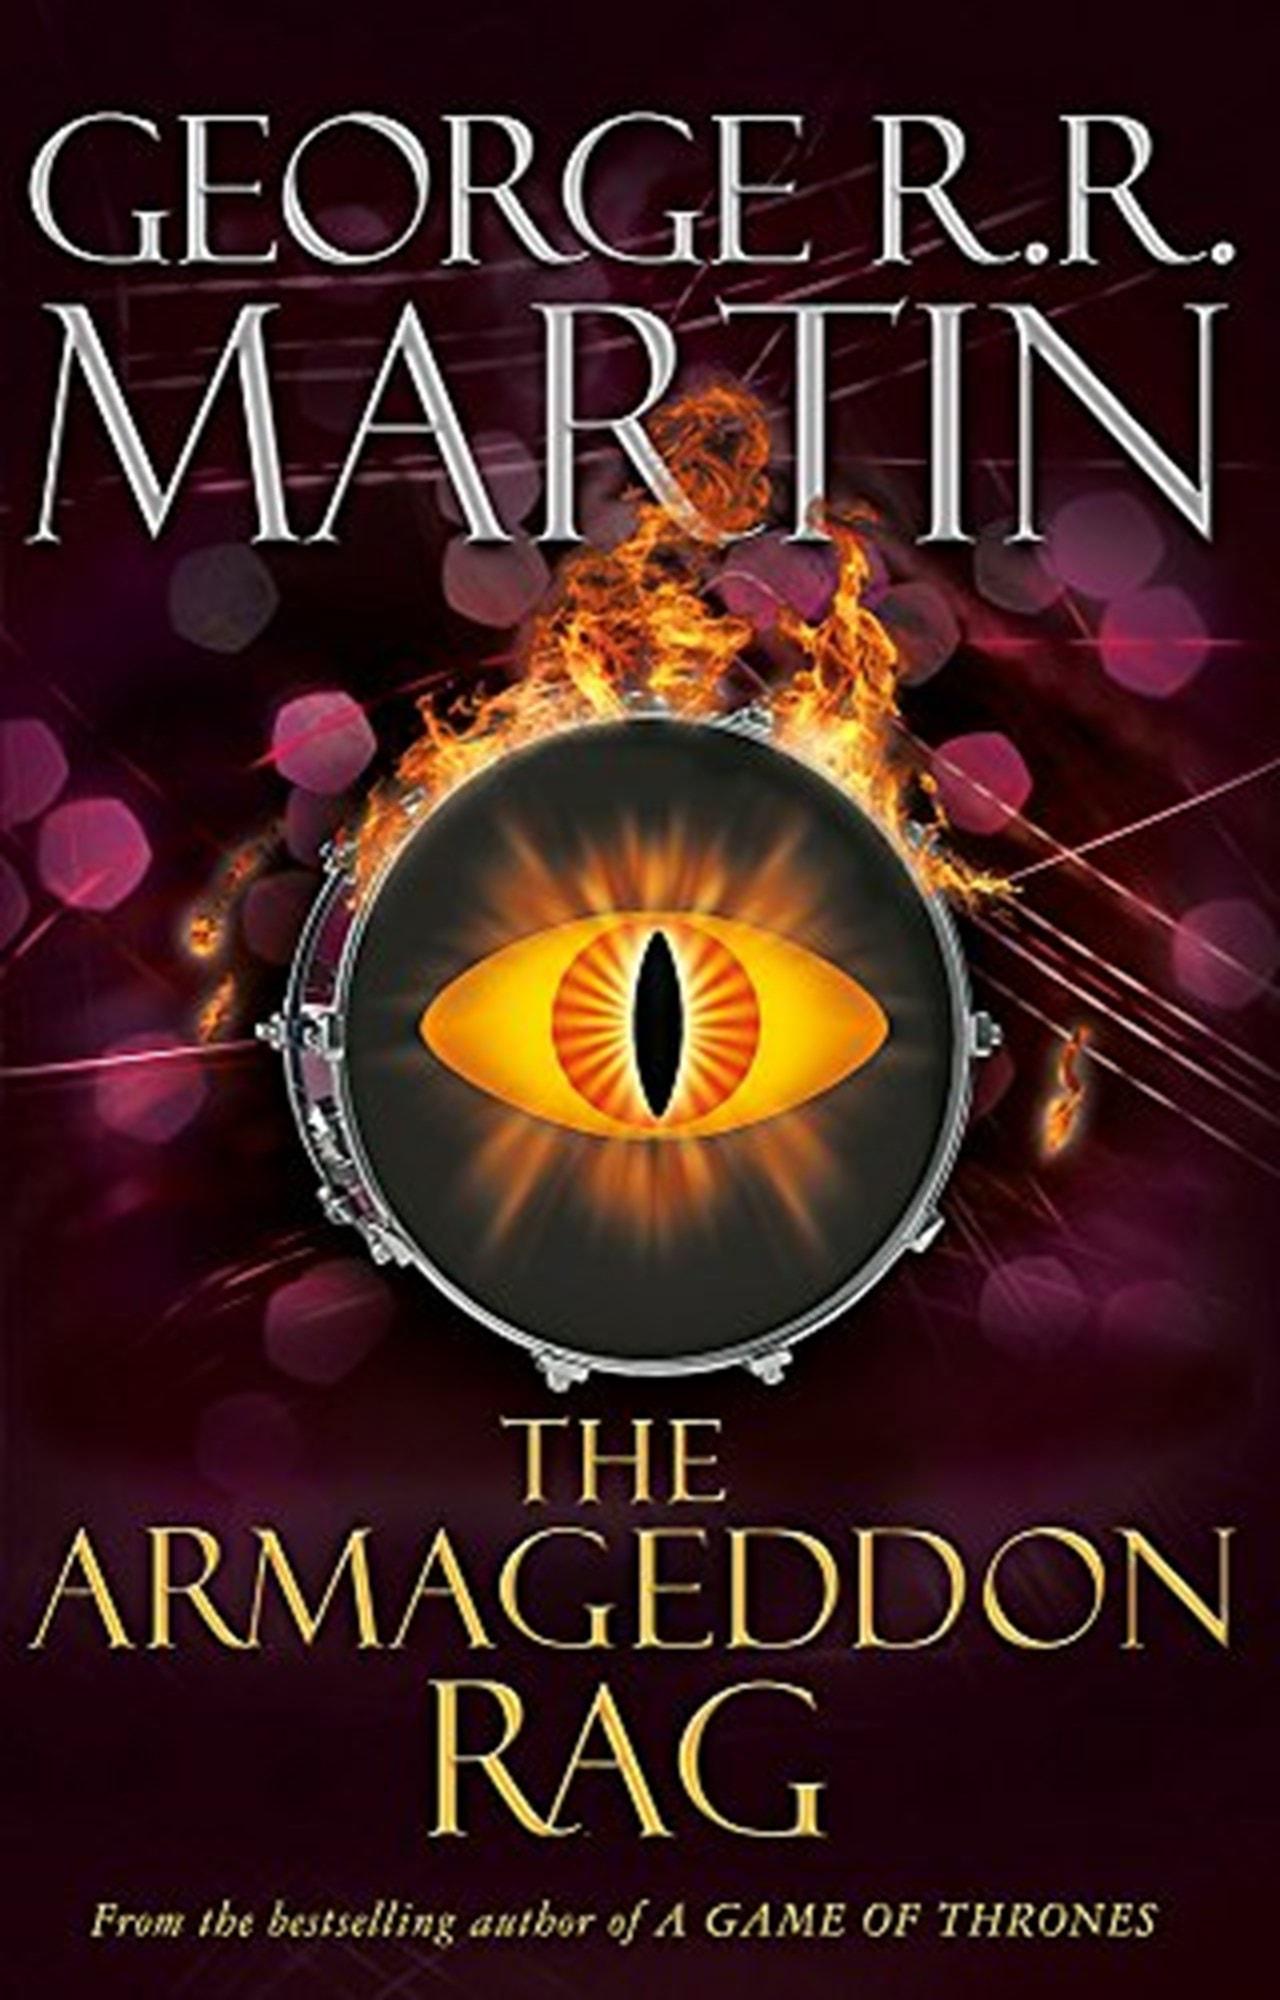 Armageddon Rag - 1